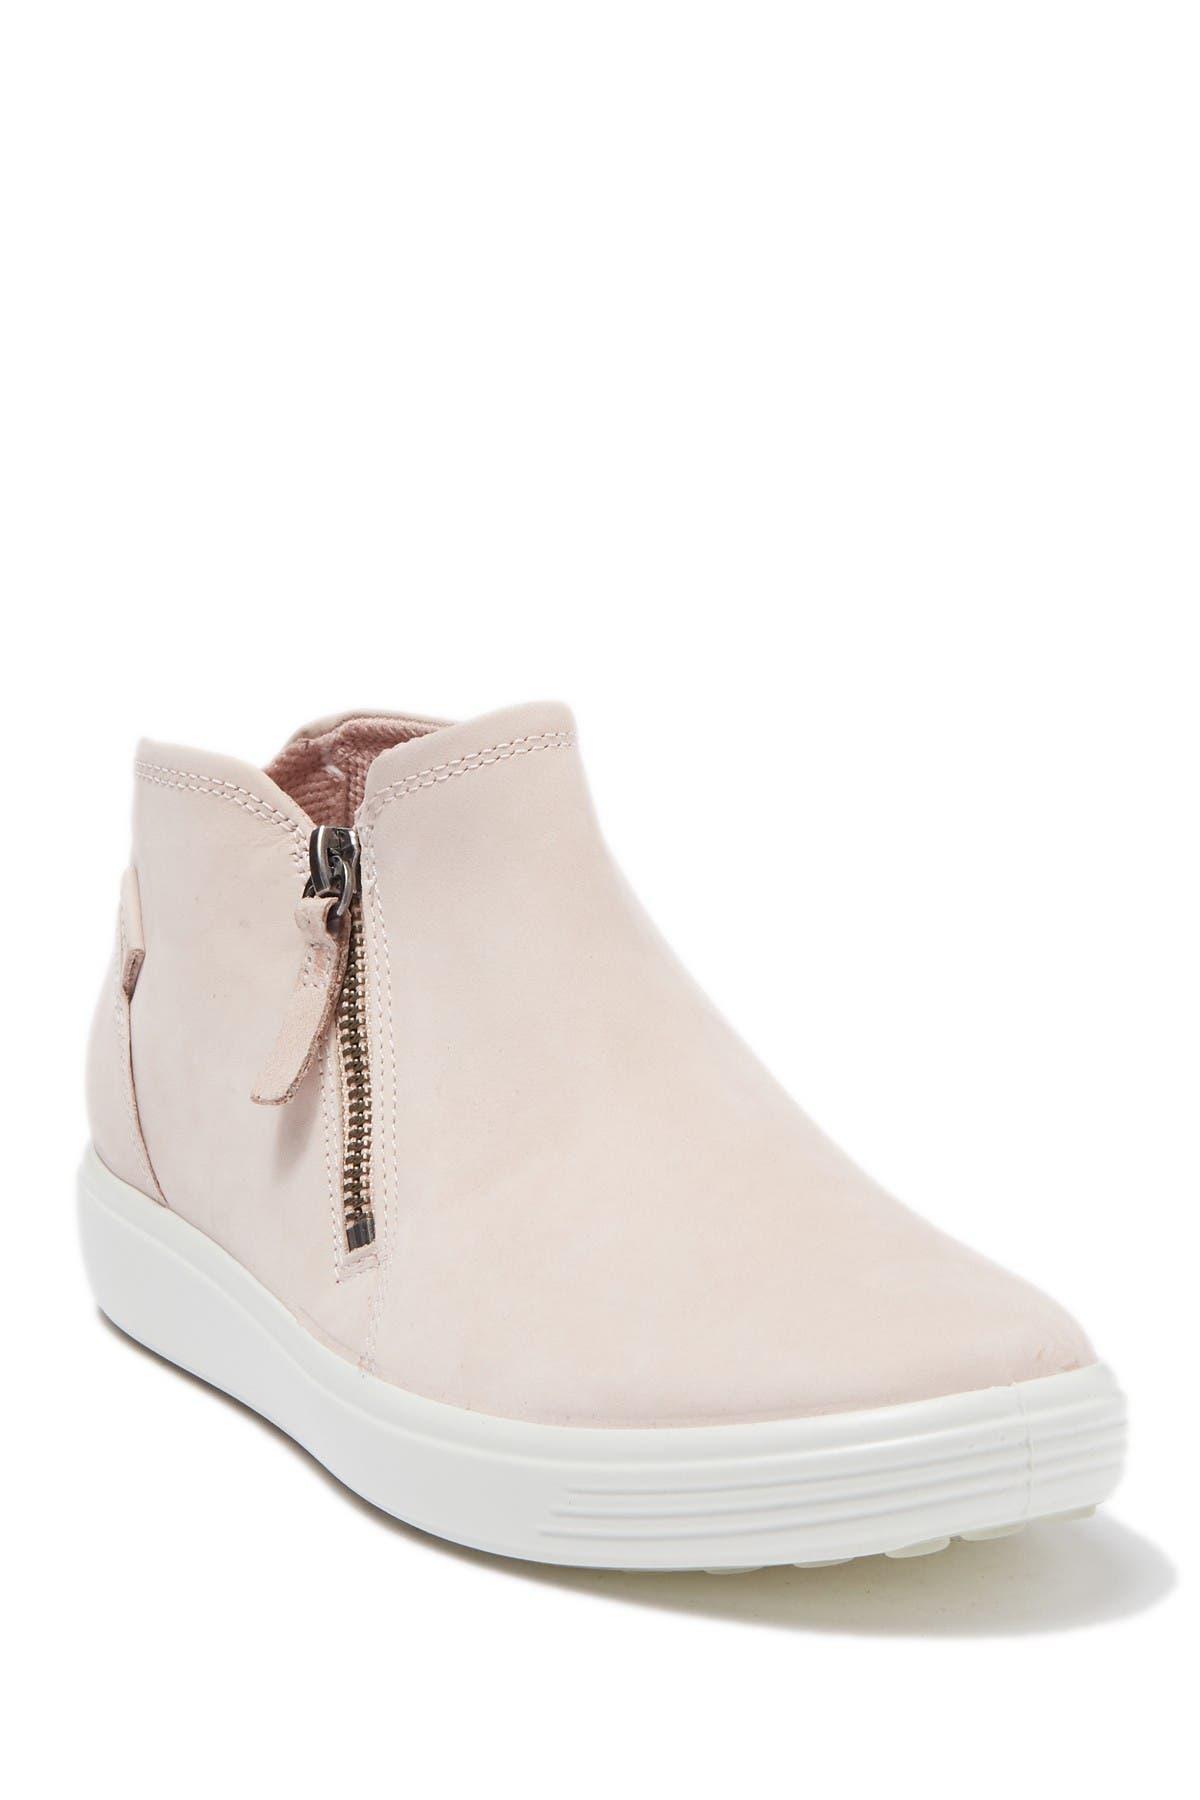 ECCO Women's Ecco Soft 7 High Top Sneaker, Size 7-7.5US - Pink